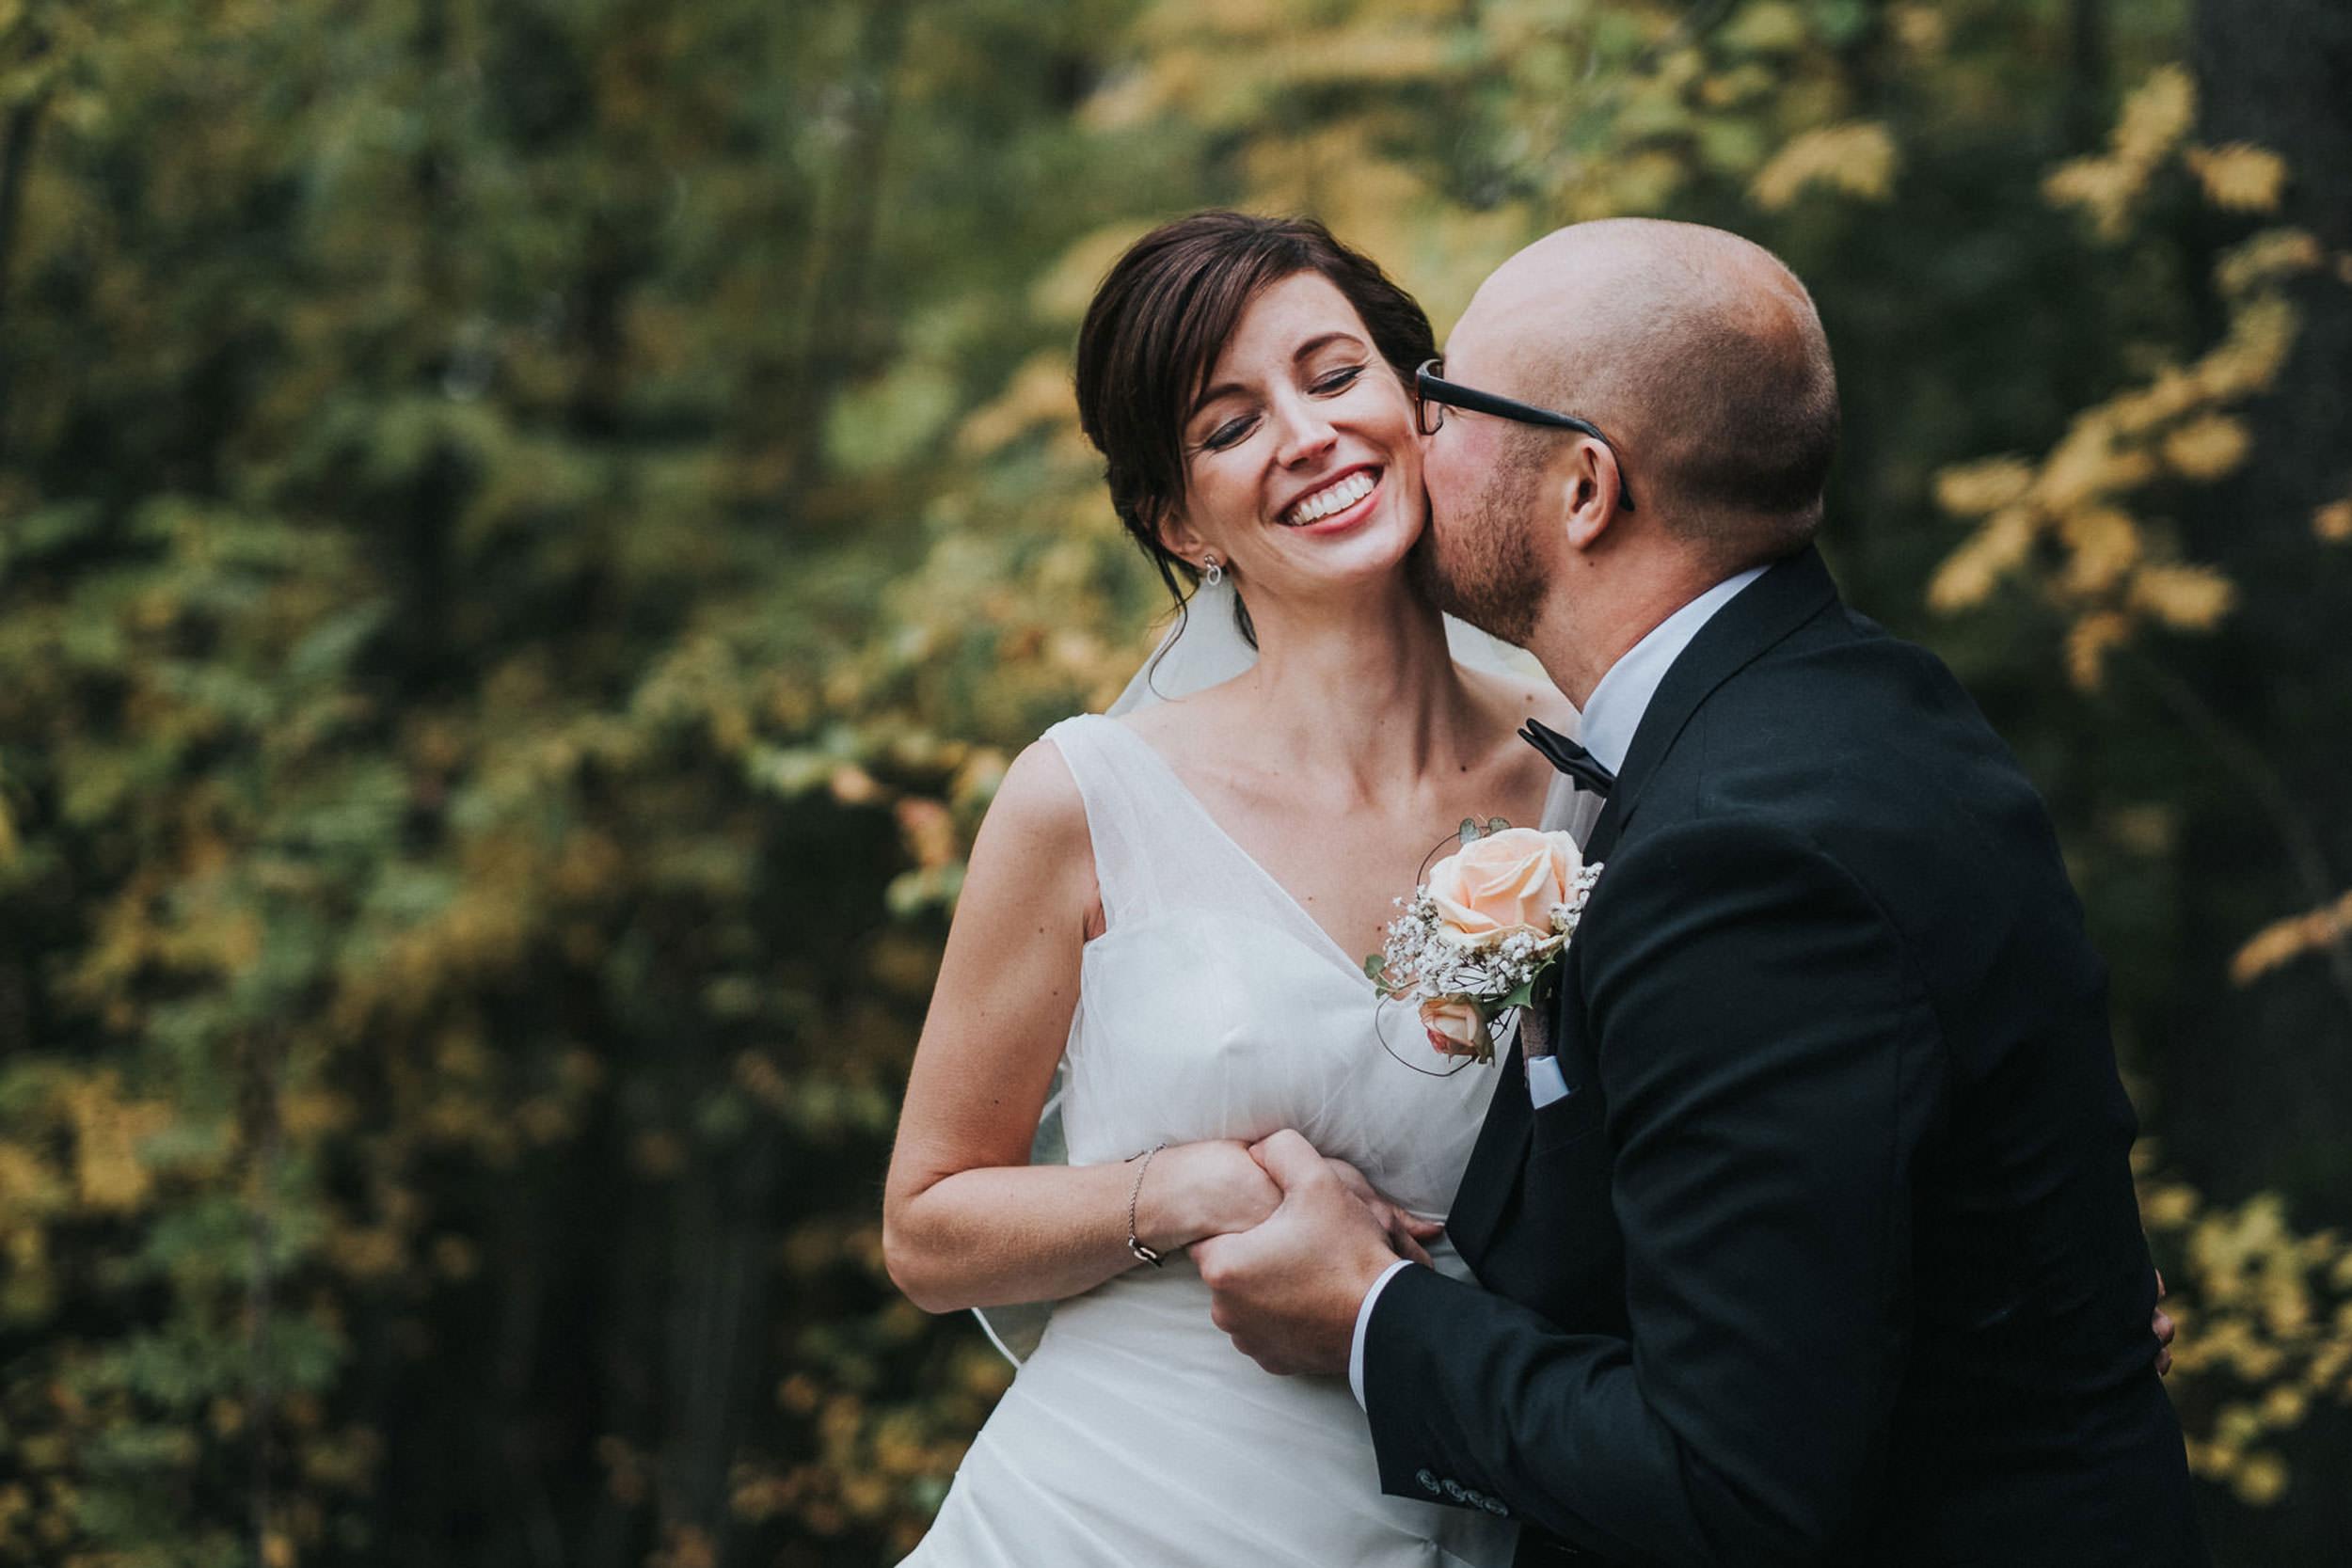 © Fotograf Jonas Burman, wedding, bröllop, brudpar, höst, autumn